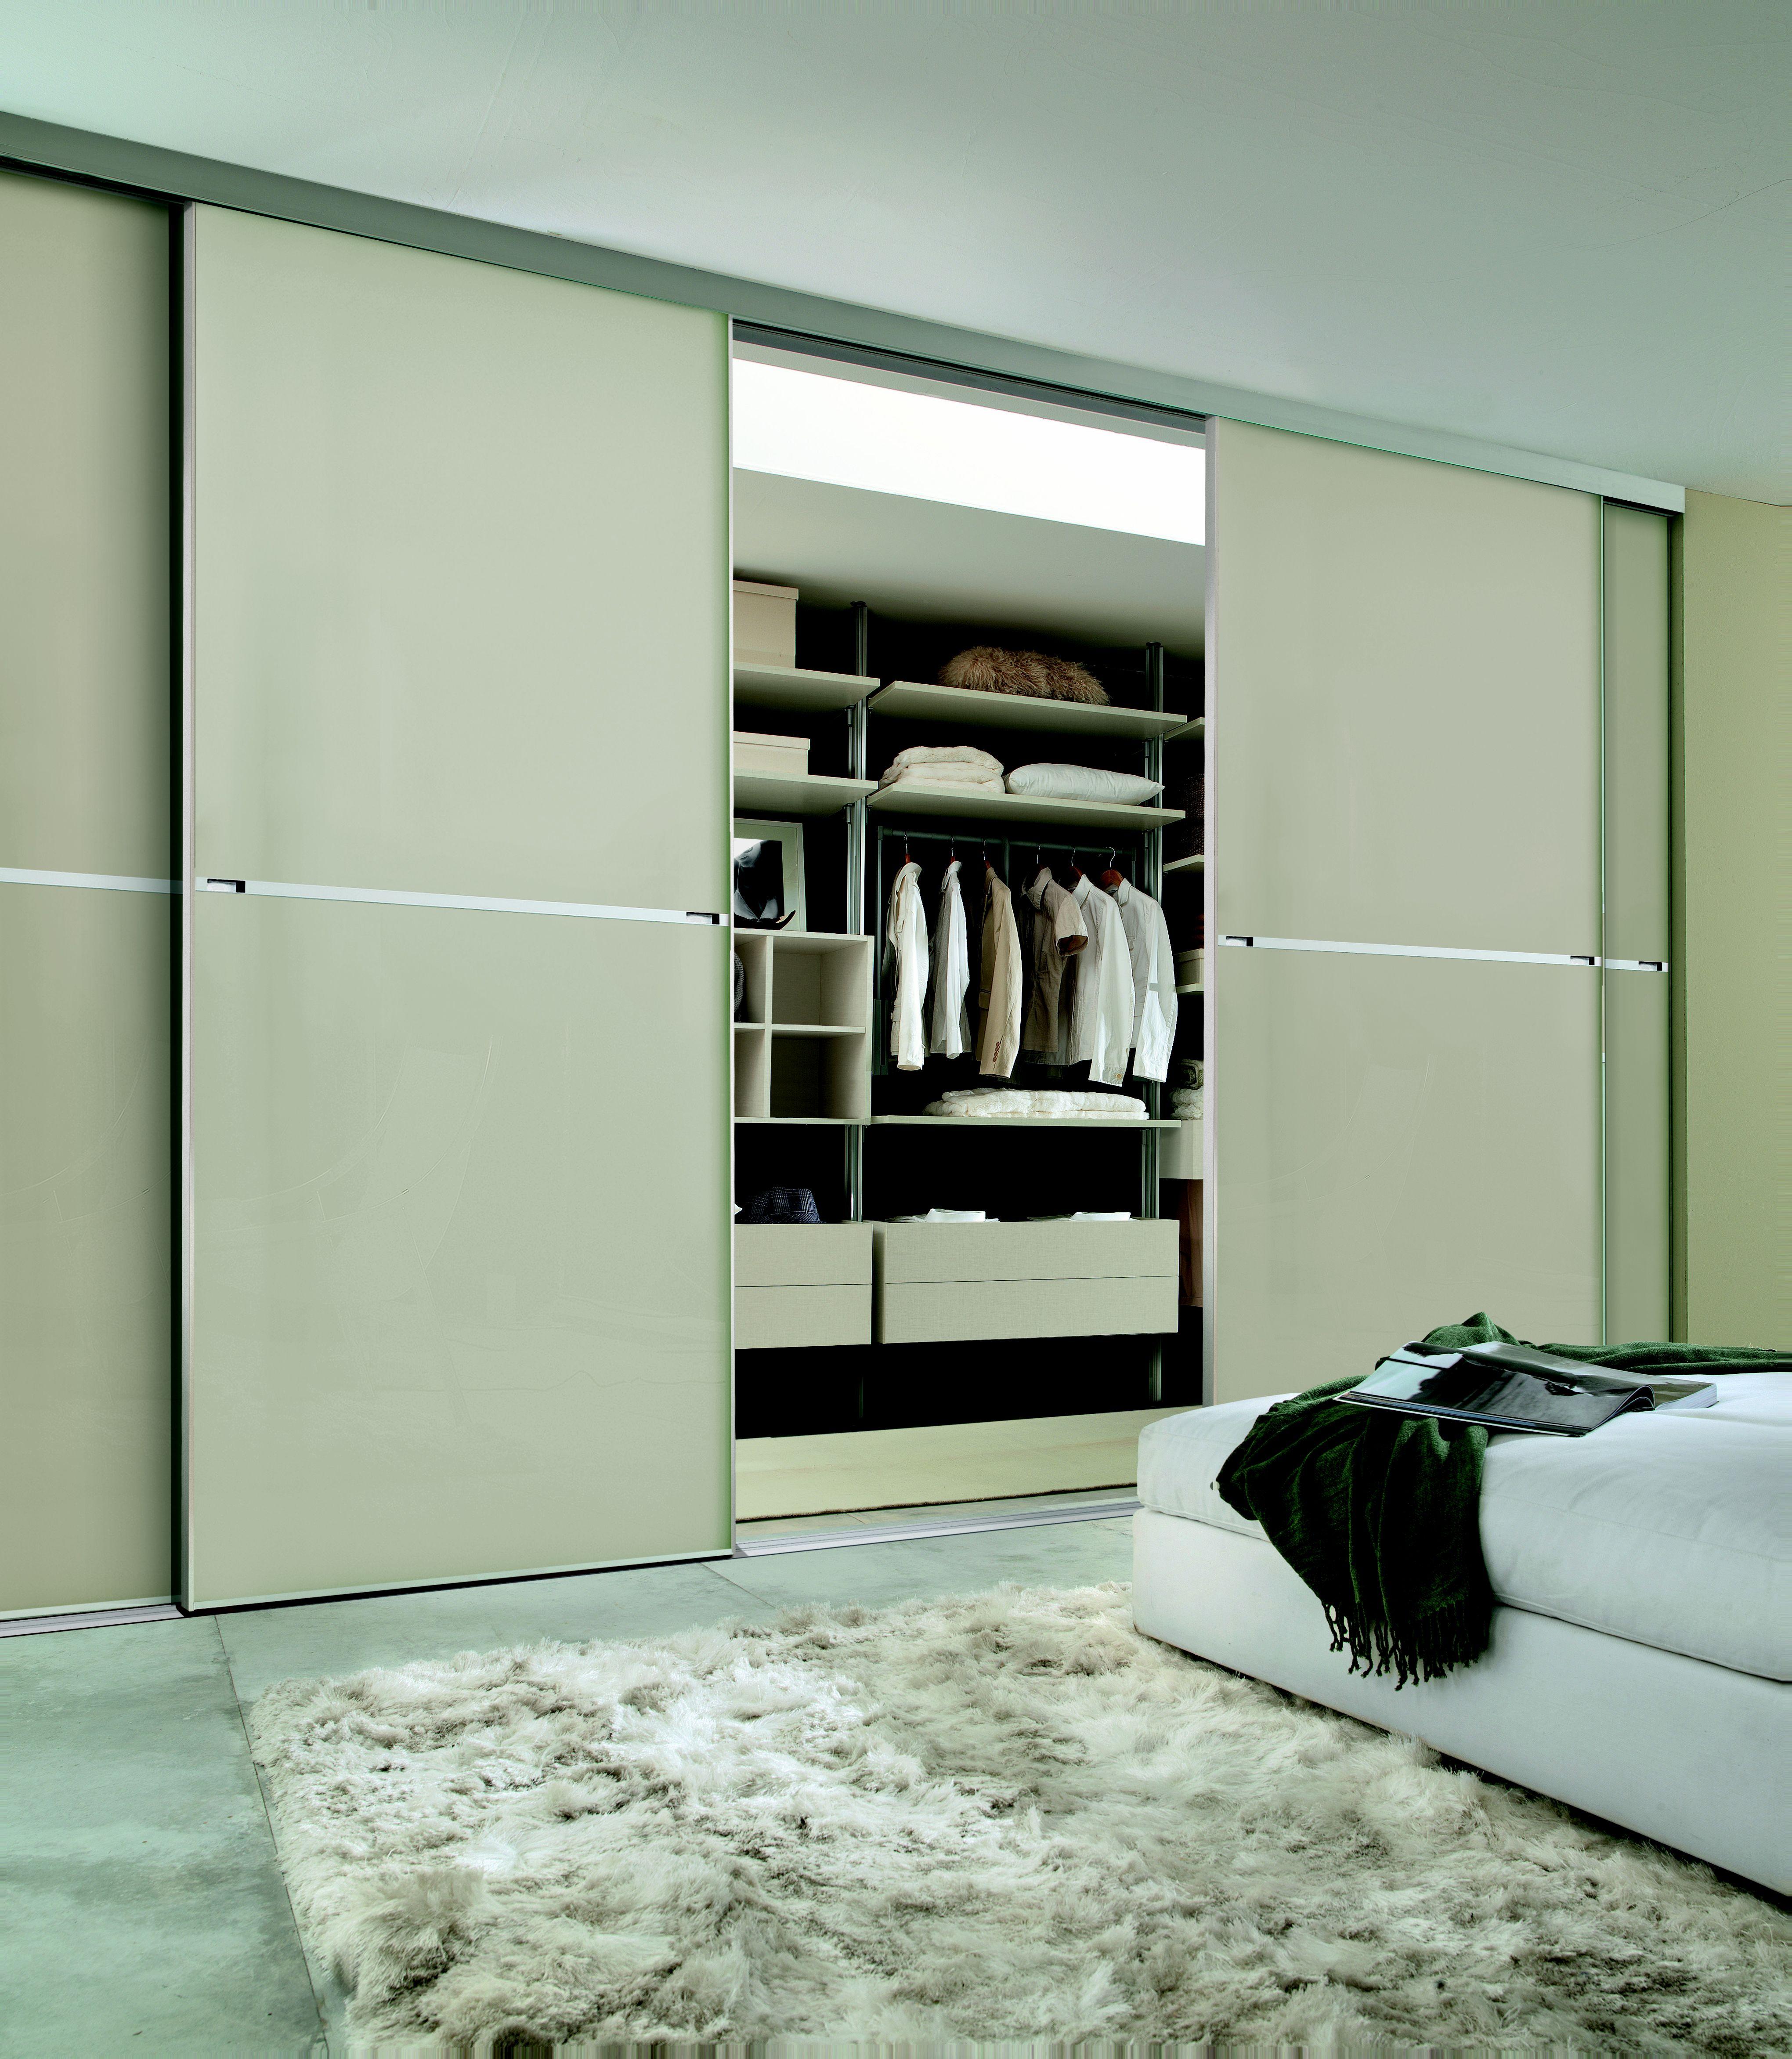 Buyeru0027s Guide to Sliding Wardrobe Doors & Sliding Wardrobe Doors u0026 Kits   Bedroom Furniture   DIY at Bu0026Q pezcame.com